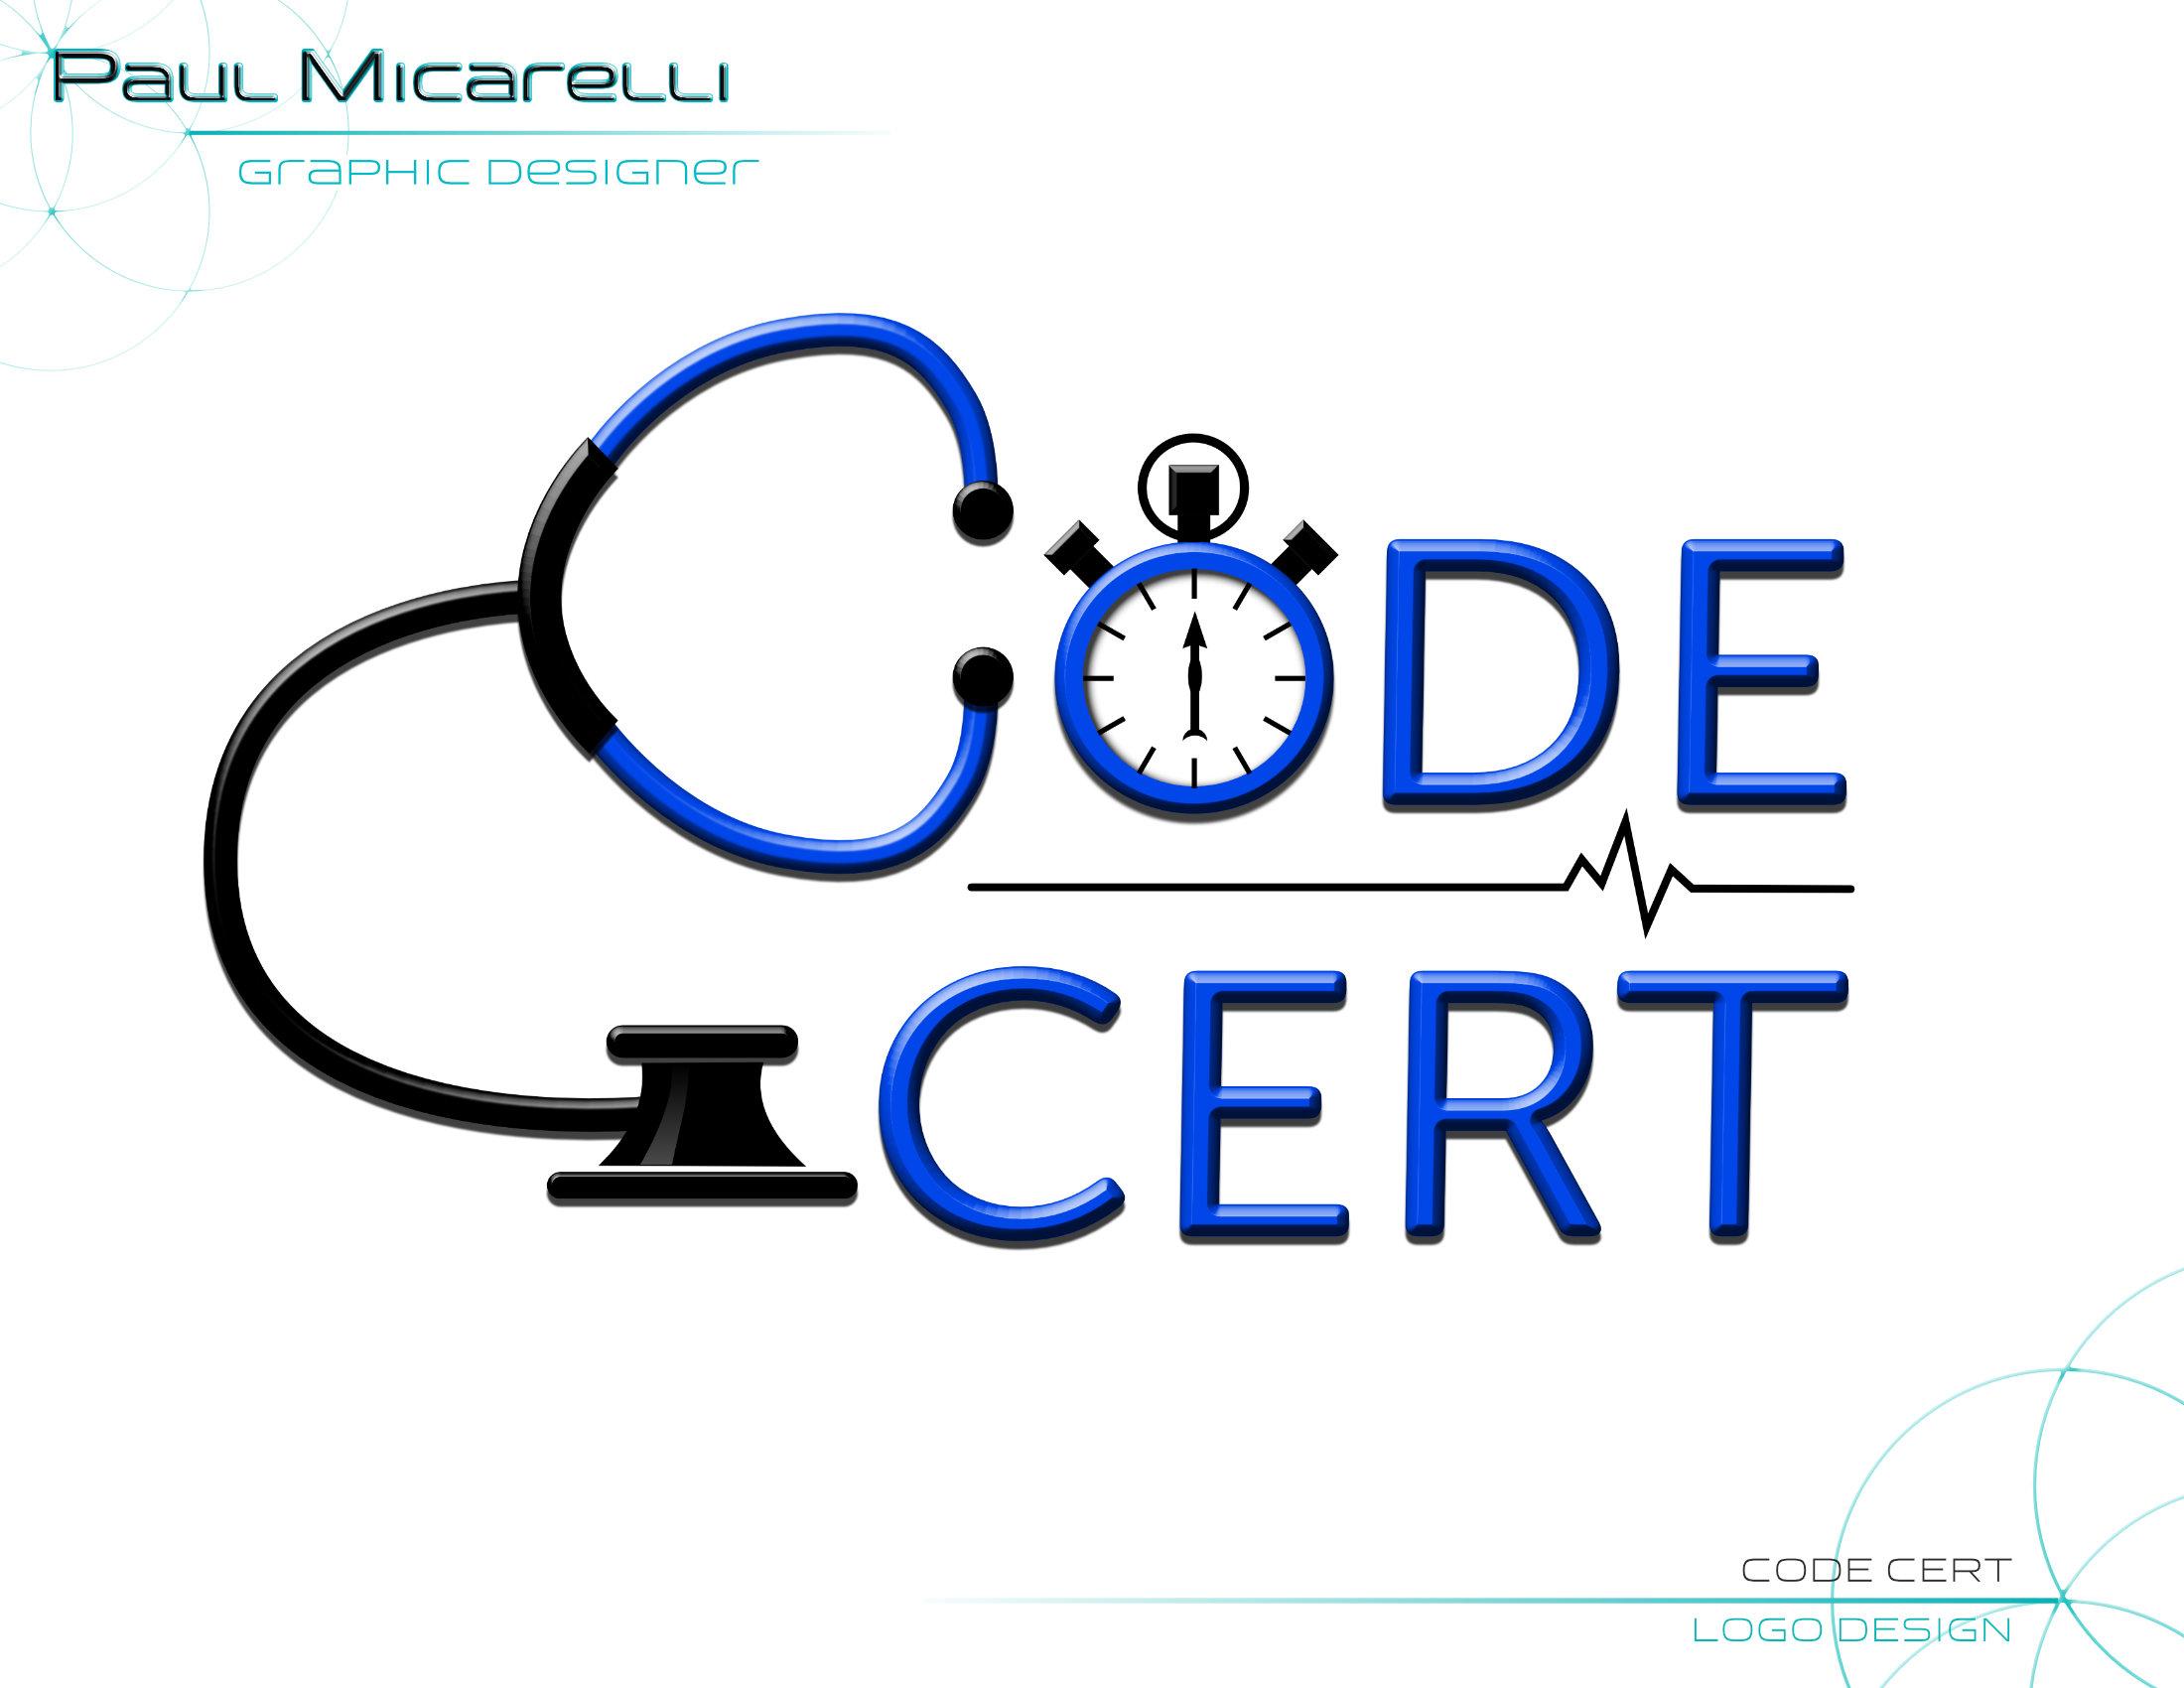 Paul-Micarelli-Code Cert-Logo